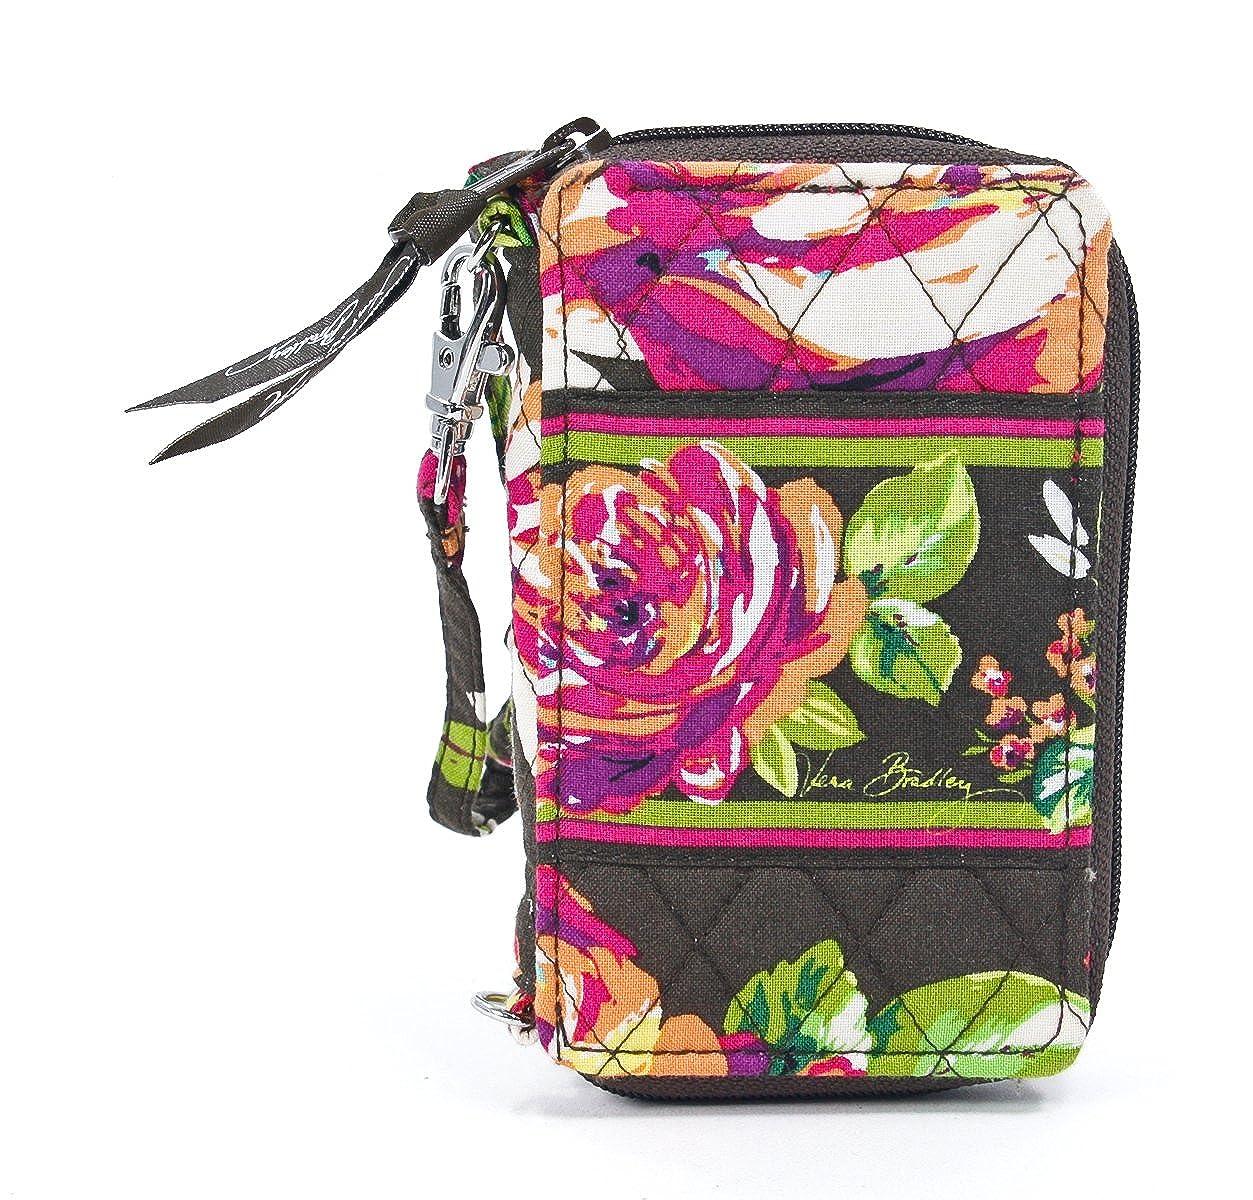 fddbb9a234f Vera Bradley Carry It All Wristlet, Bittersweet, OS  Handbags  Amazon.com